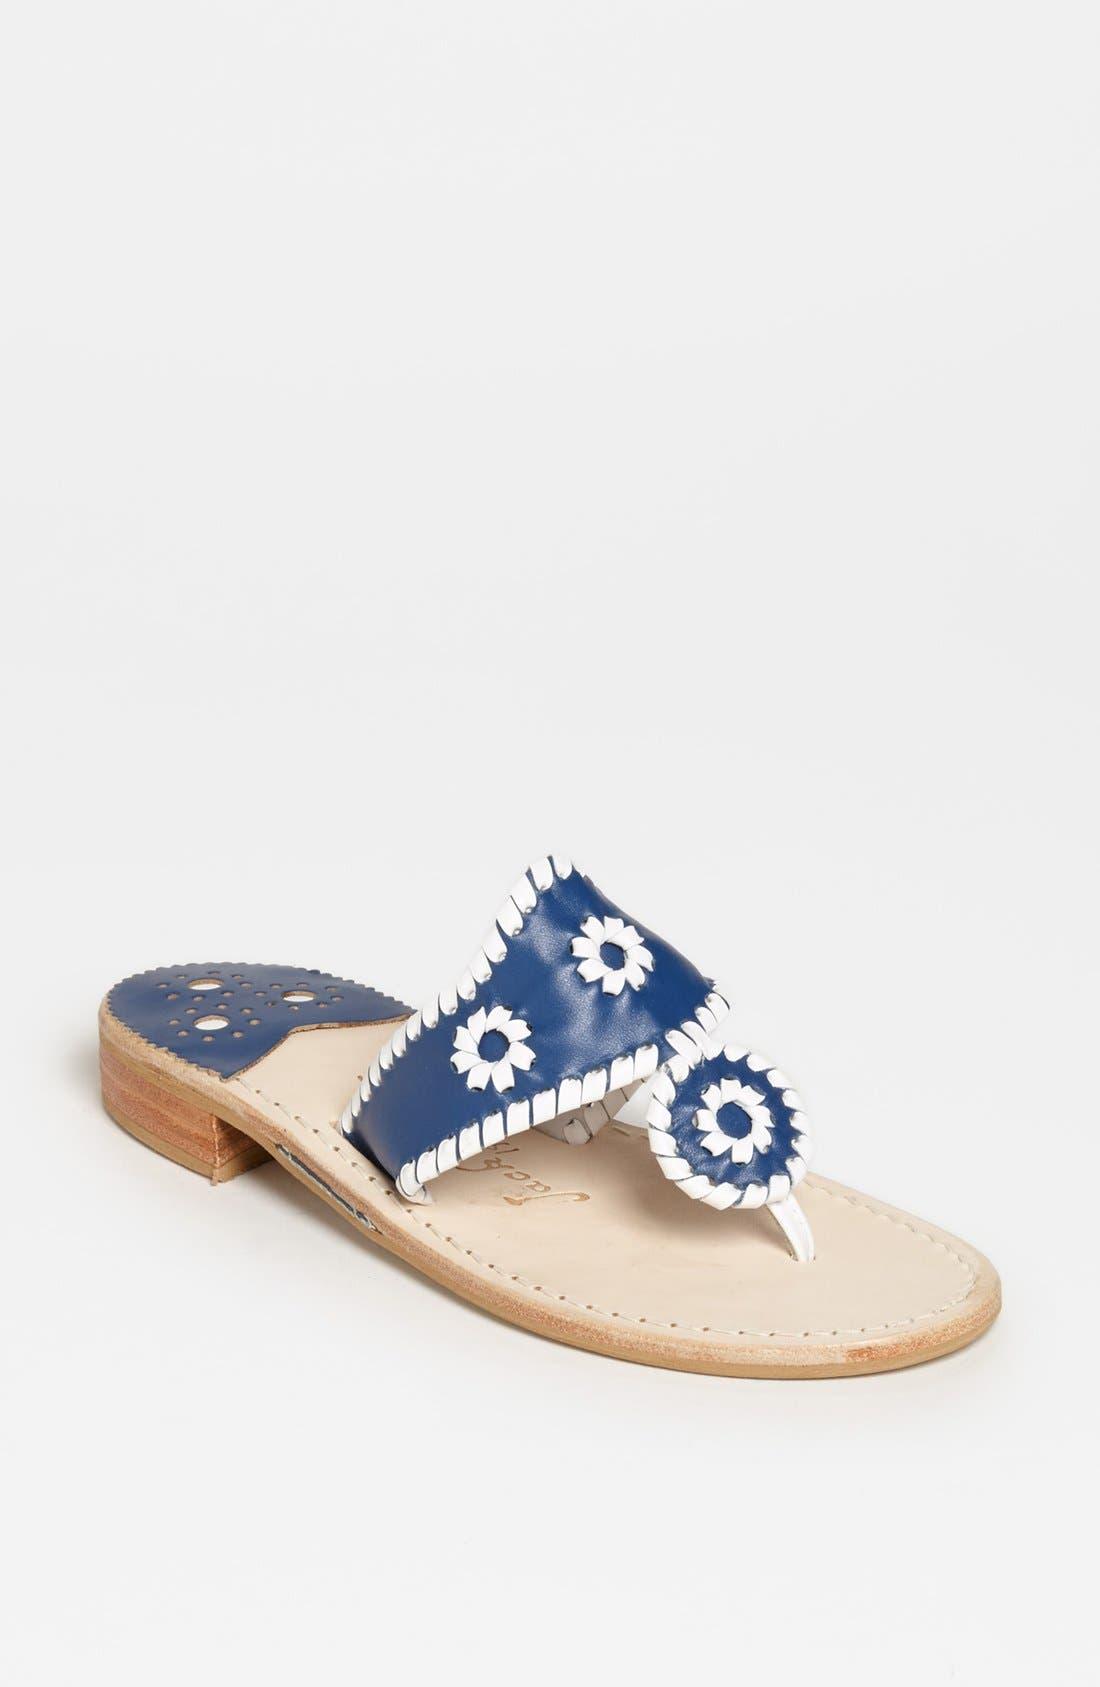 Alternate Image 1 Selected - Jack Rogers 'Palm Beach' Sandal